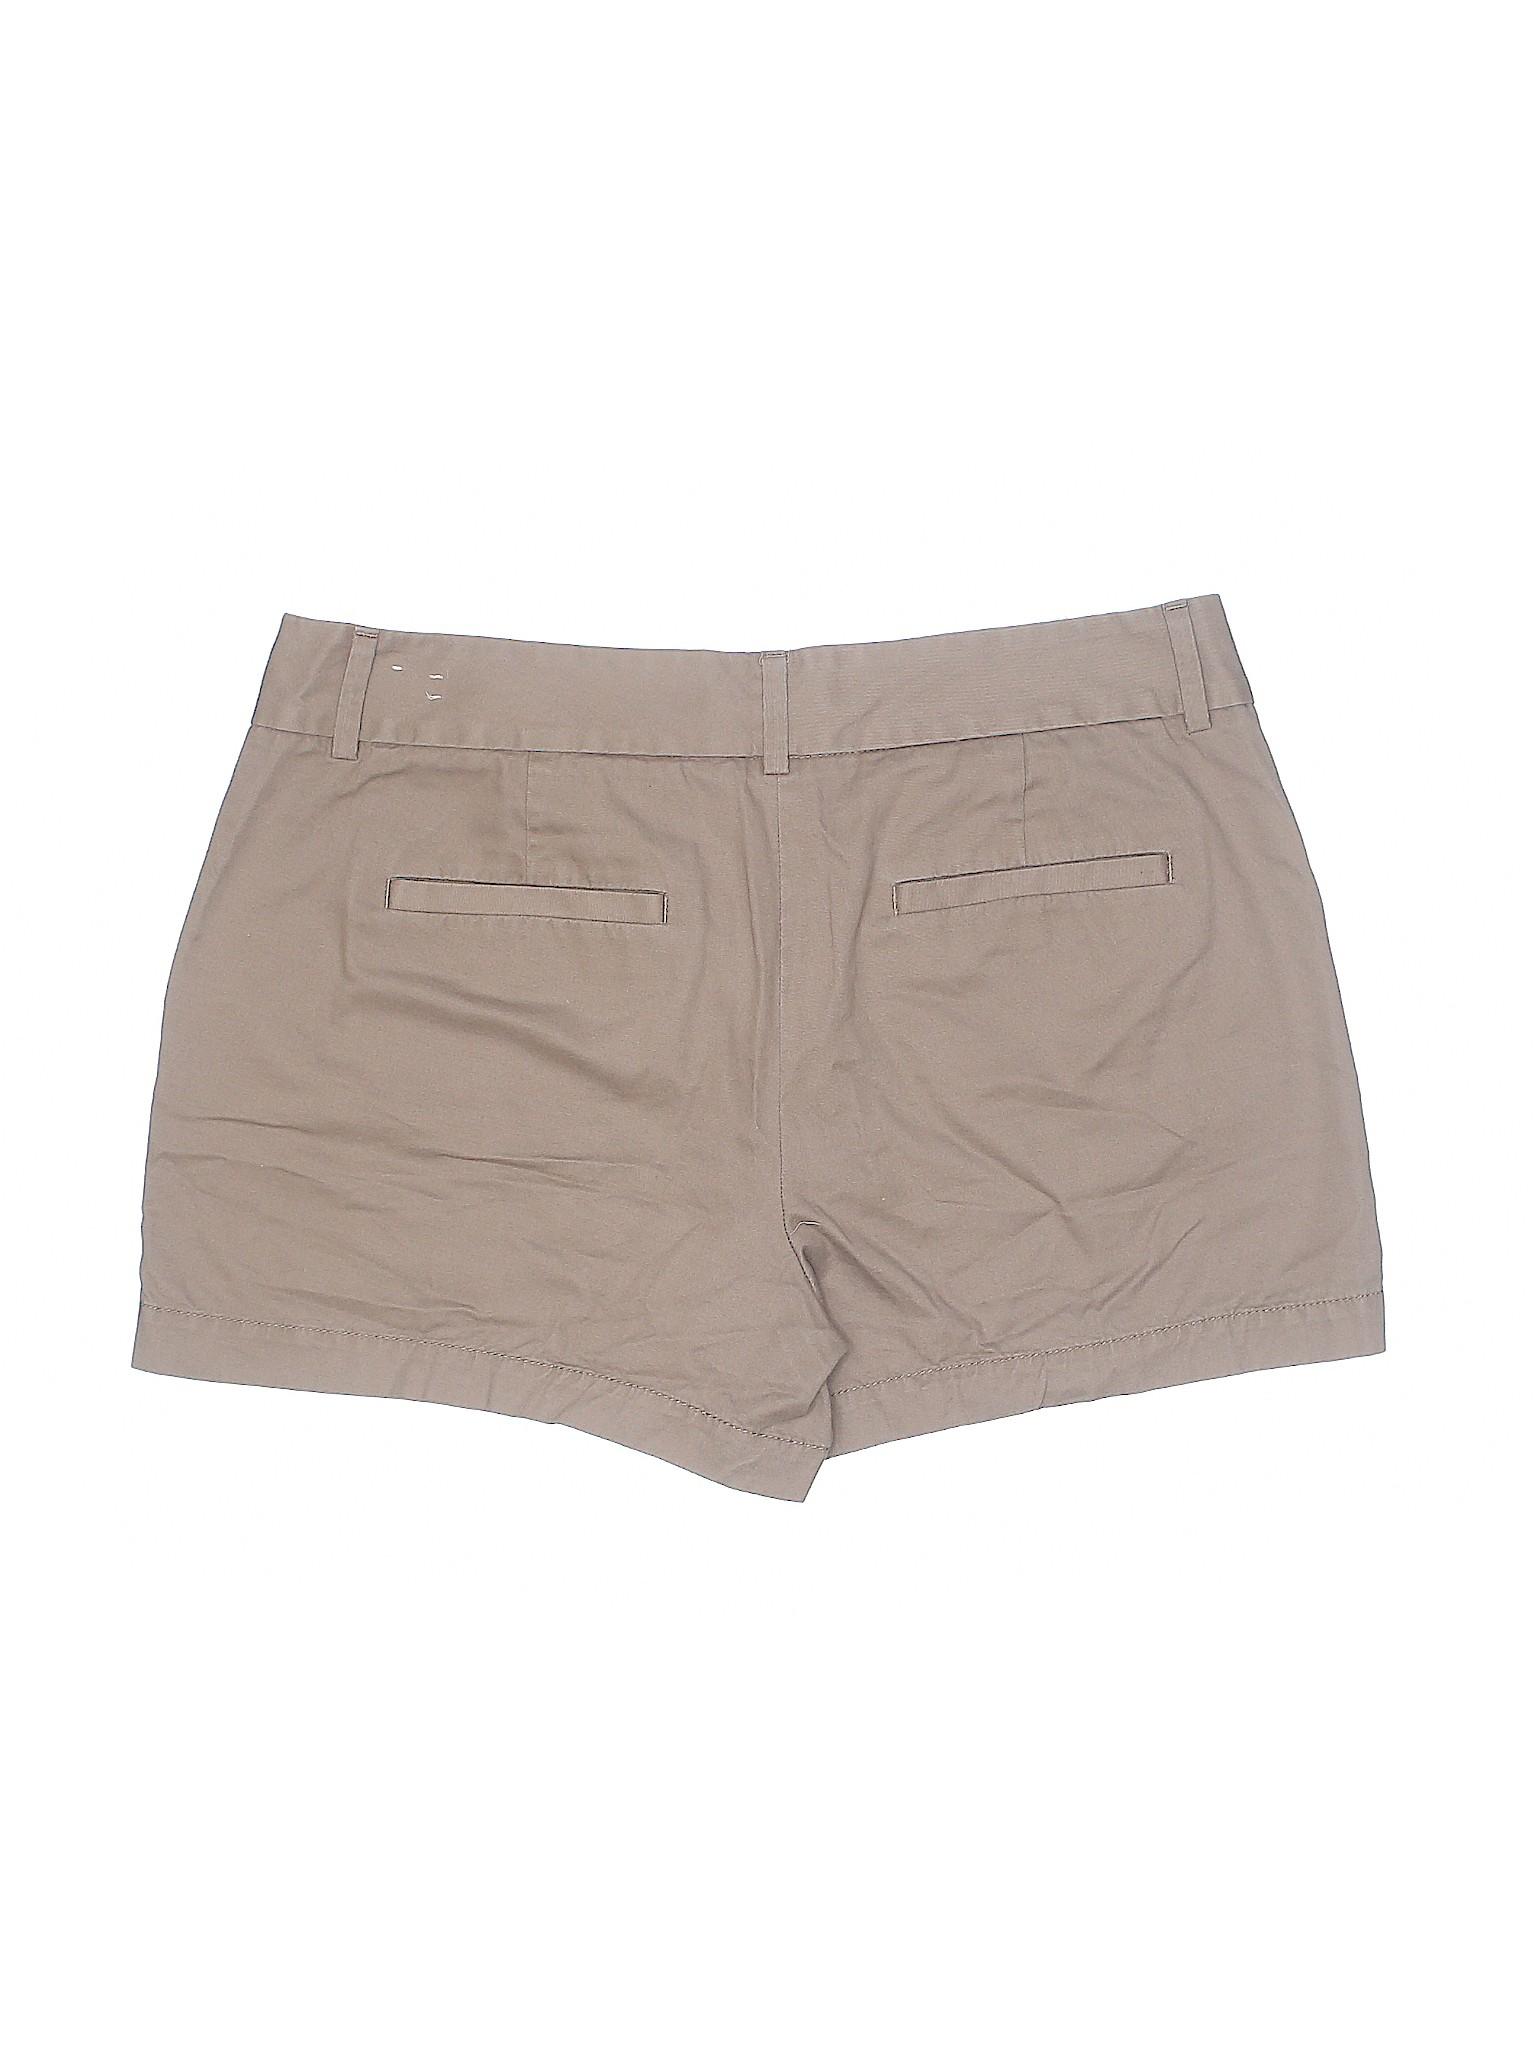 LOFT Shorts Boutique Khaki Taylor Ann EPqnwFxa0